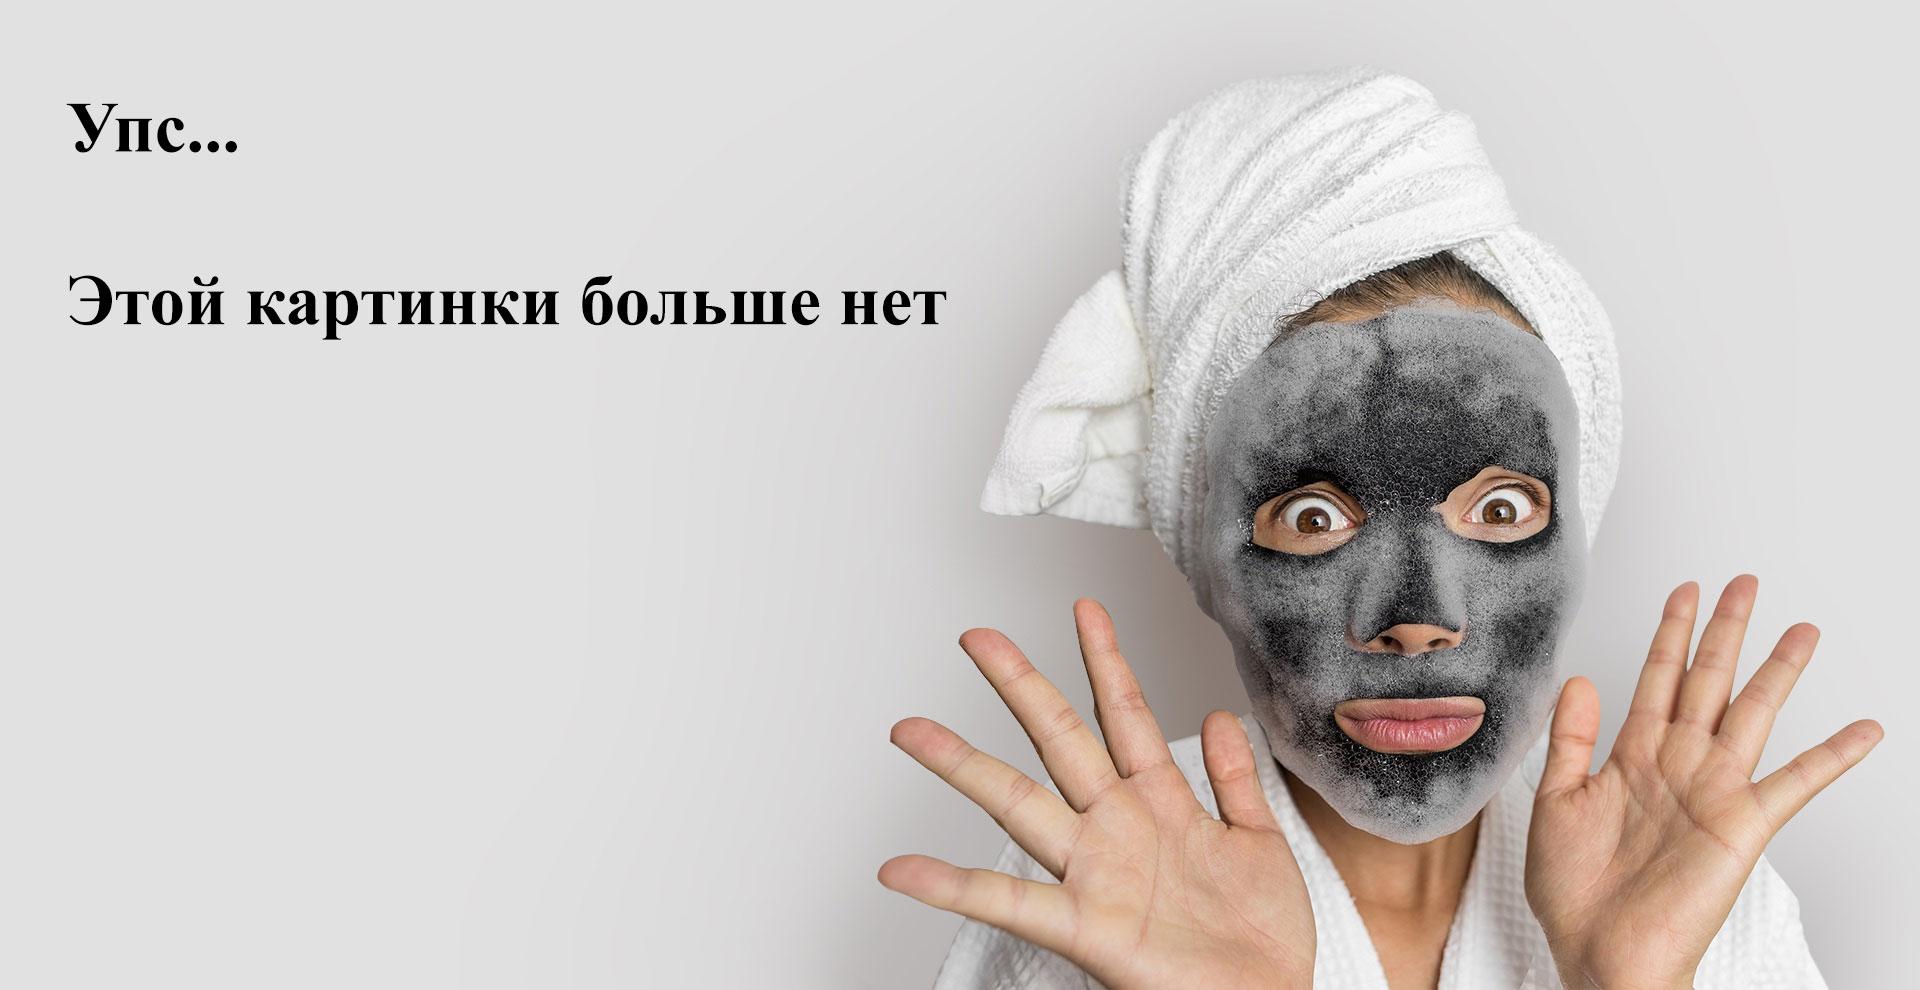 Estel, Спрей-уход для волос Otium Volume, 200 мл (УЦЕНКА)